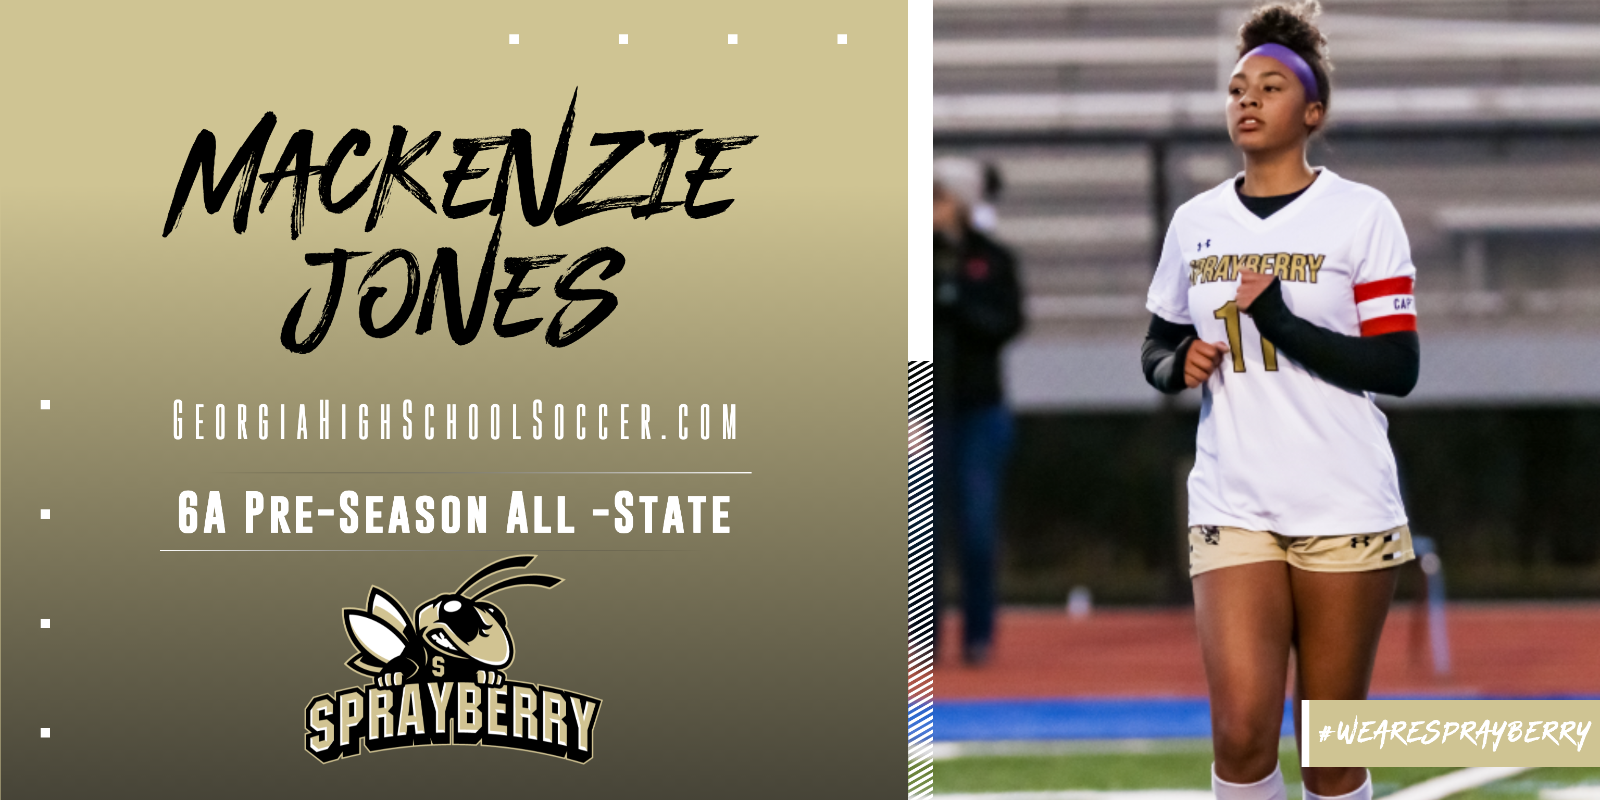 Mackenzie Jones Earns Preseason Honors! ⚽️